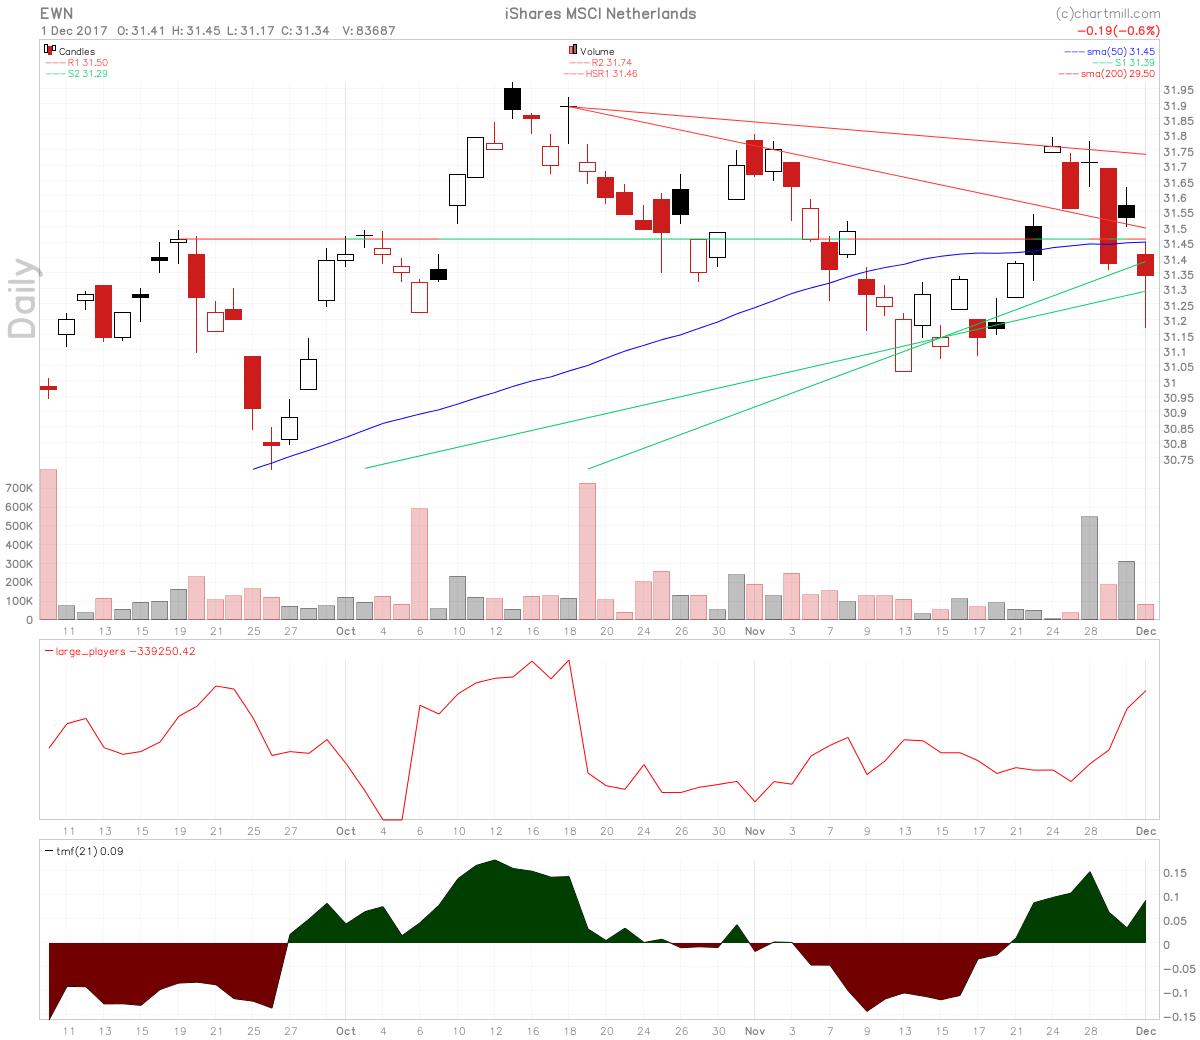 iShares MSCI Netherlands ETF chart